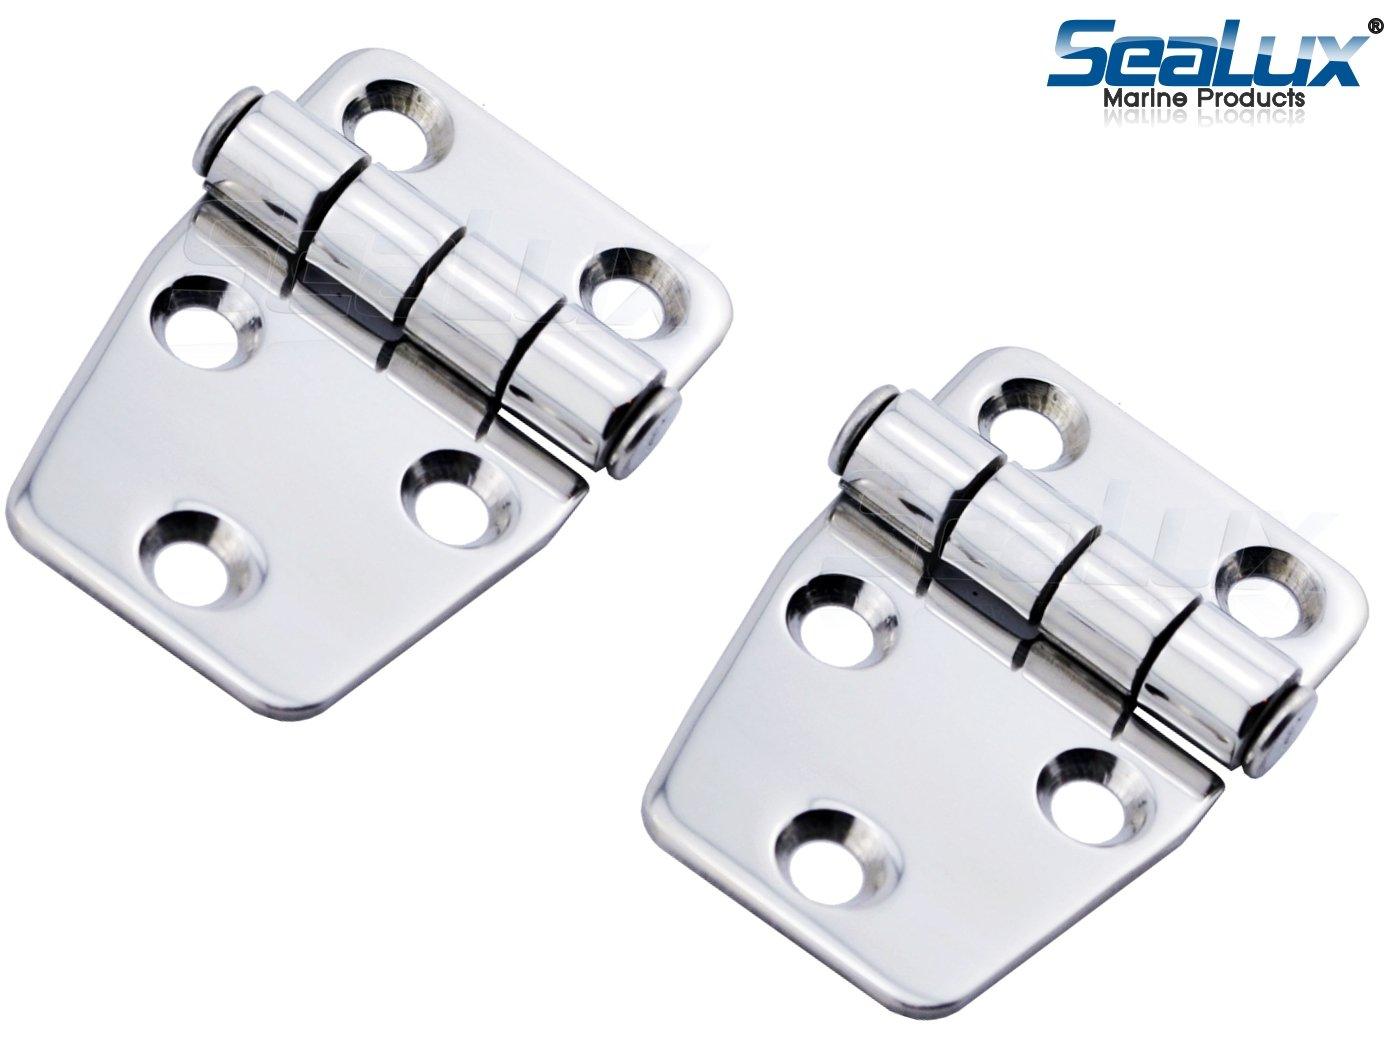 SeaLux Marine SS Short Side Hinge 2-1/8'' x 1-1/2'' for Locker / Hatch Door (Pair)